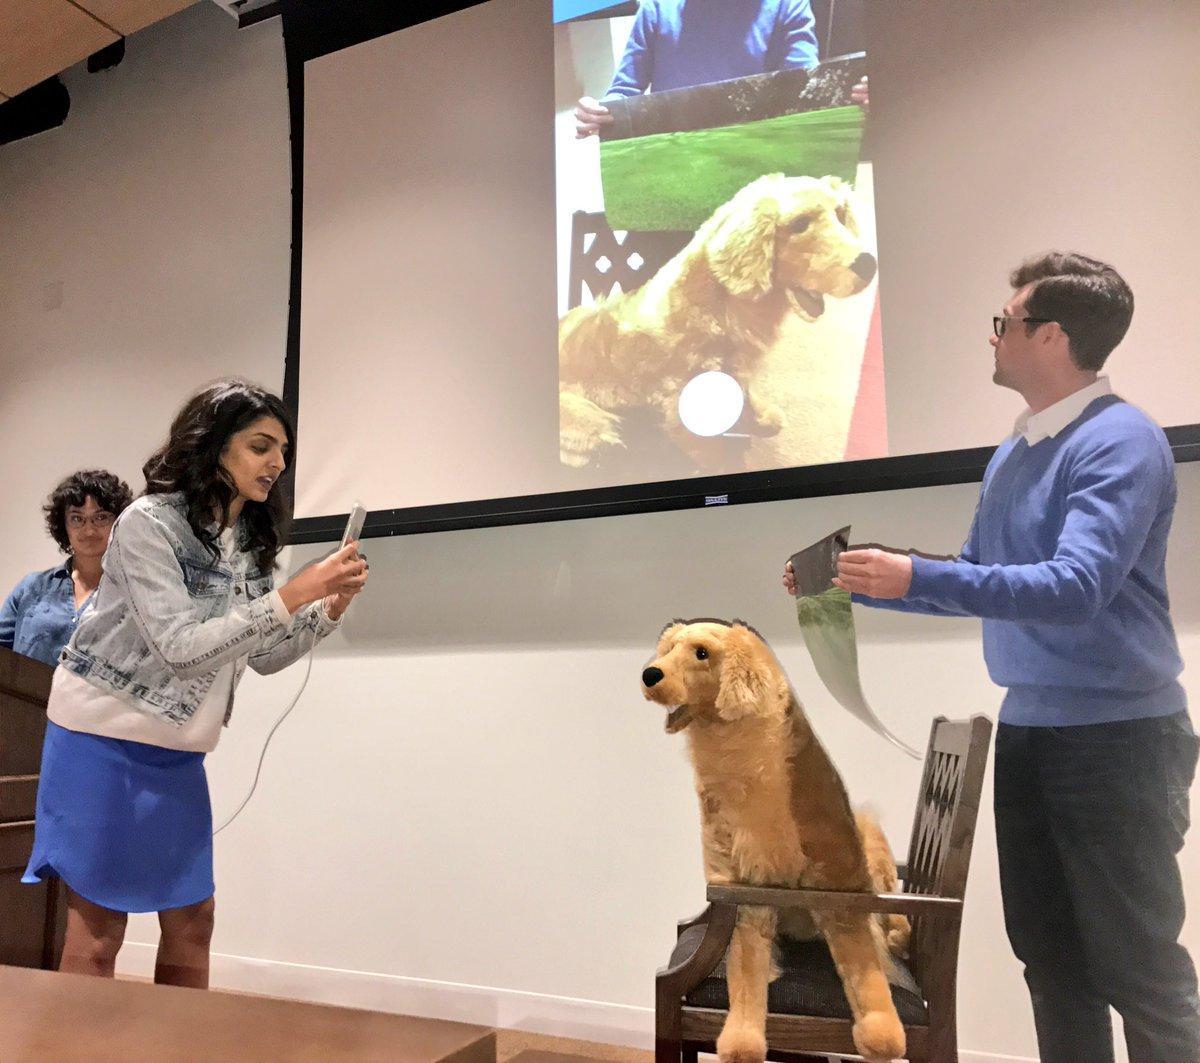 Digital LA - USC Annenberg demo day features social media startups